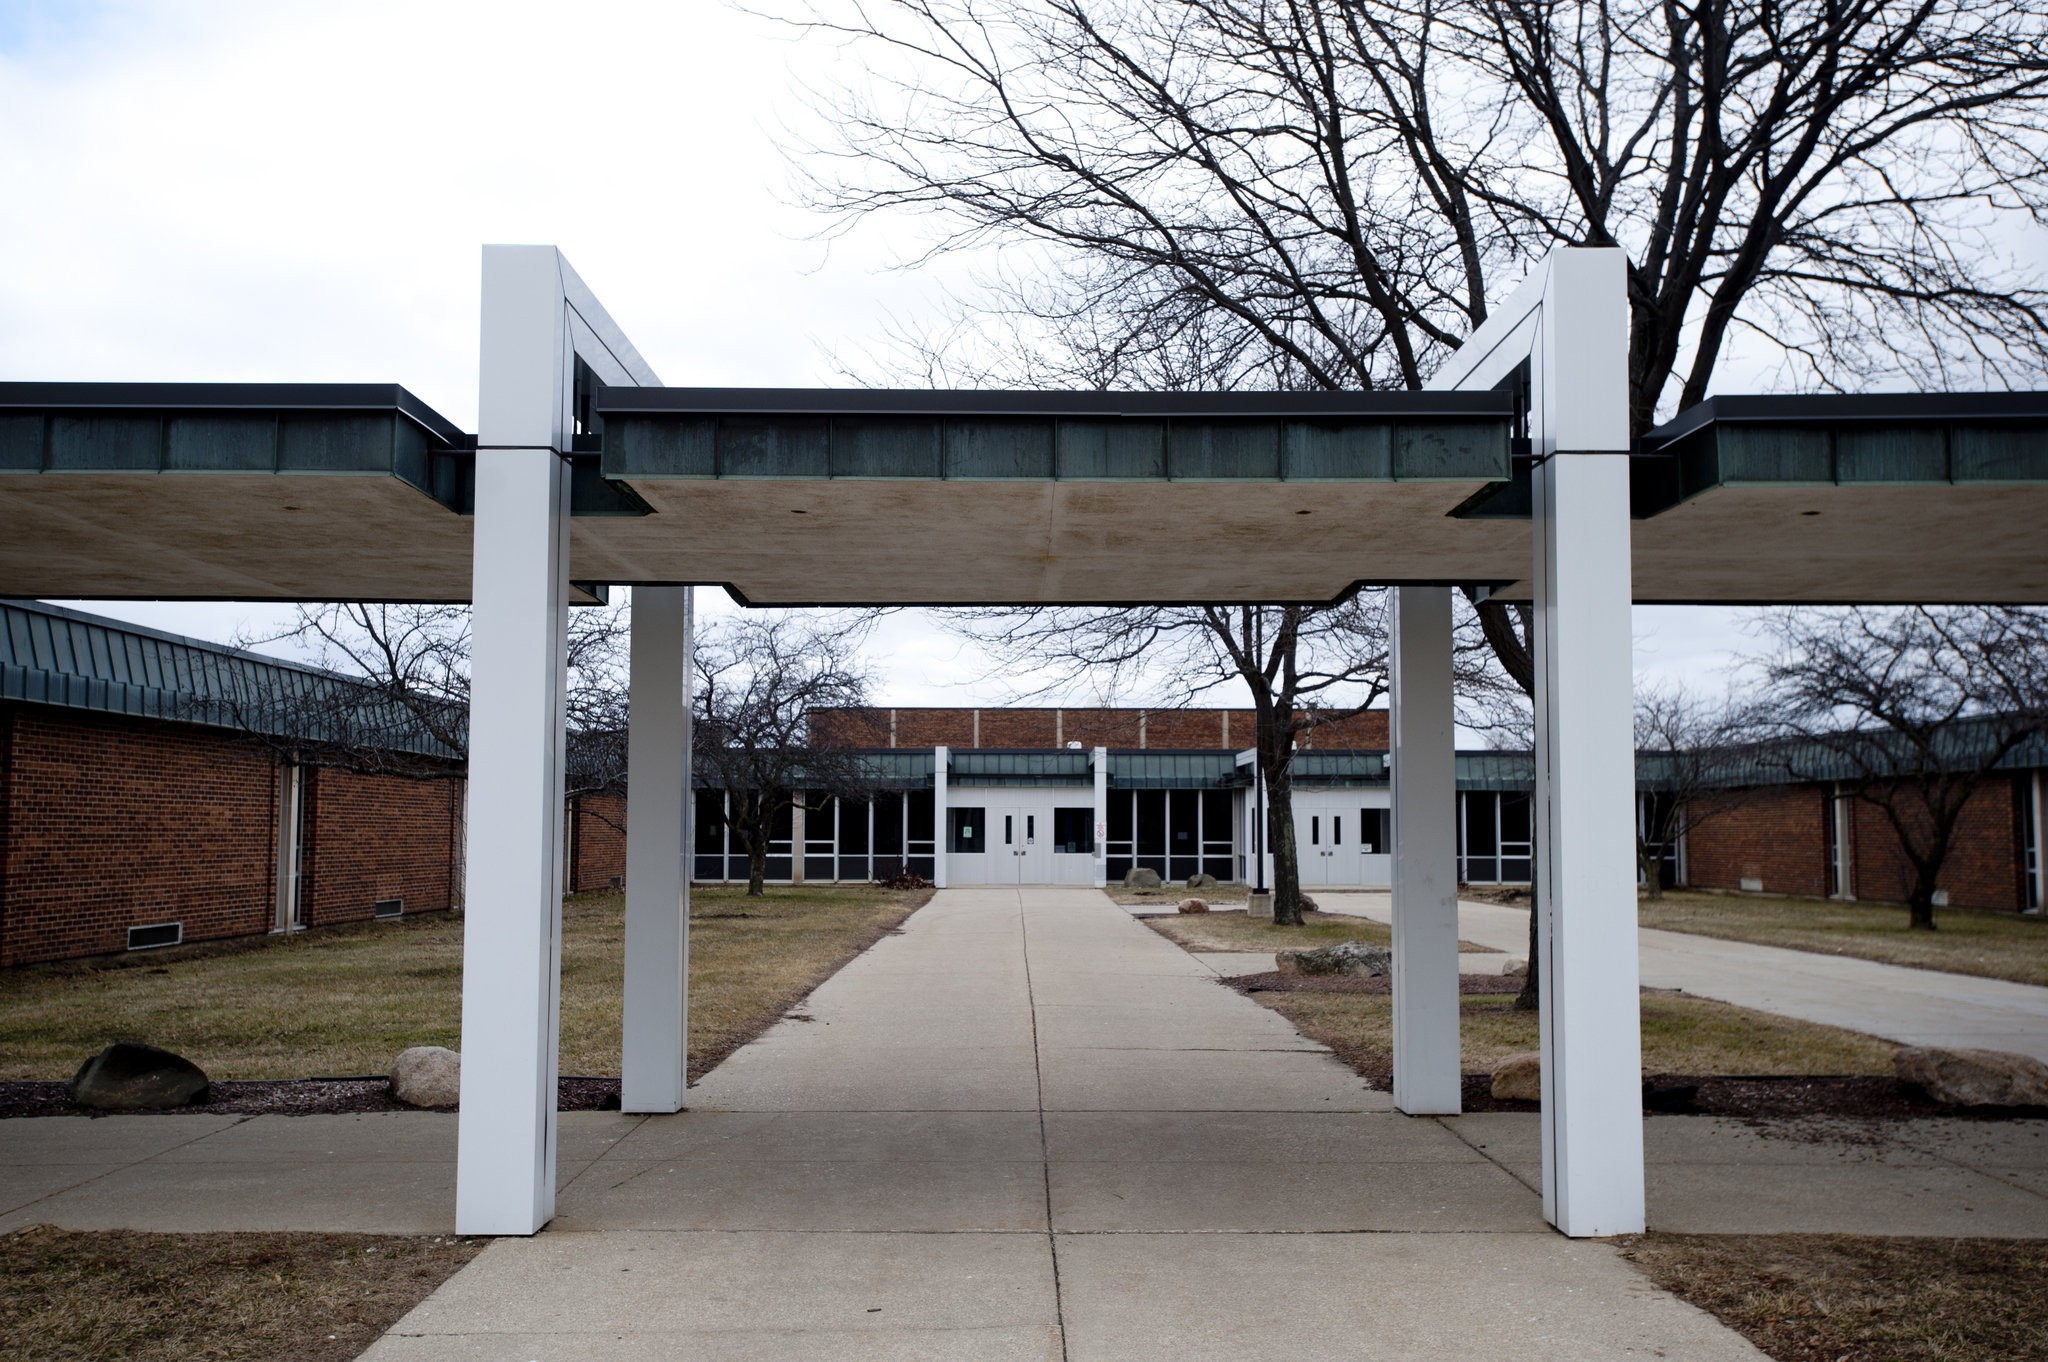 Swartz Creek middle schooler hit by car during walk to school - mlive.com